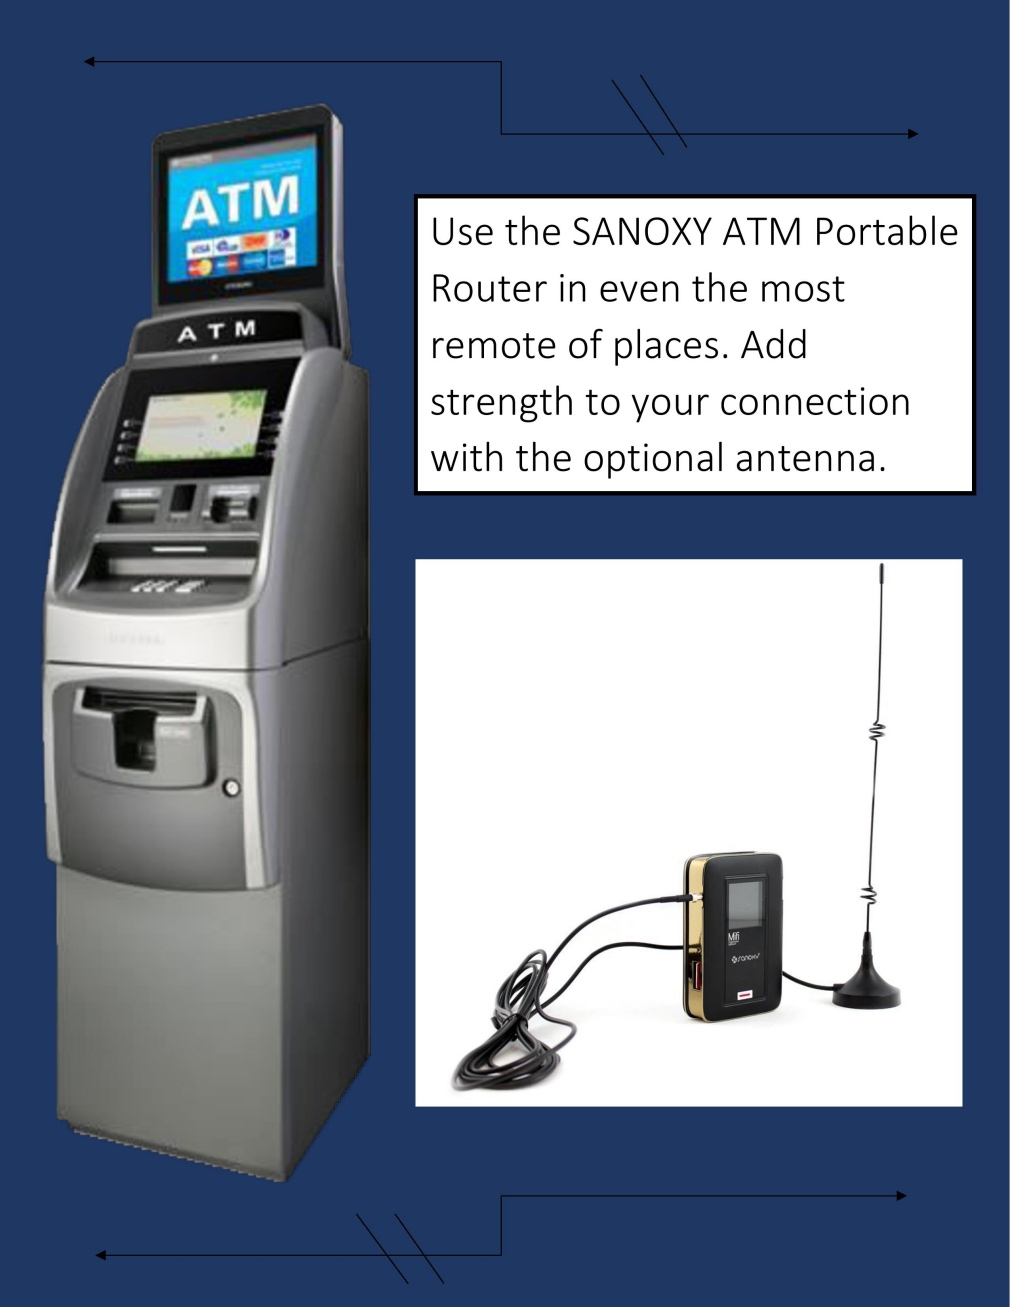 ATM POS KIOSK Wireless Ethernet Router